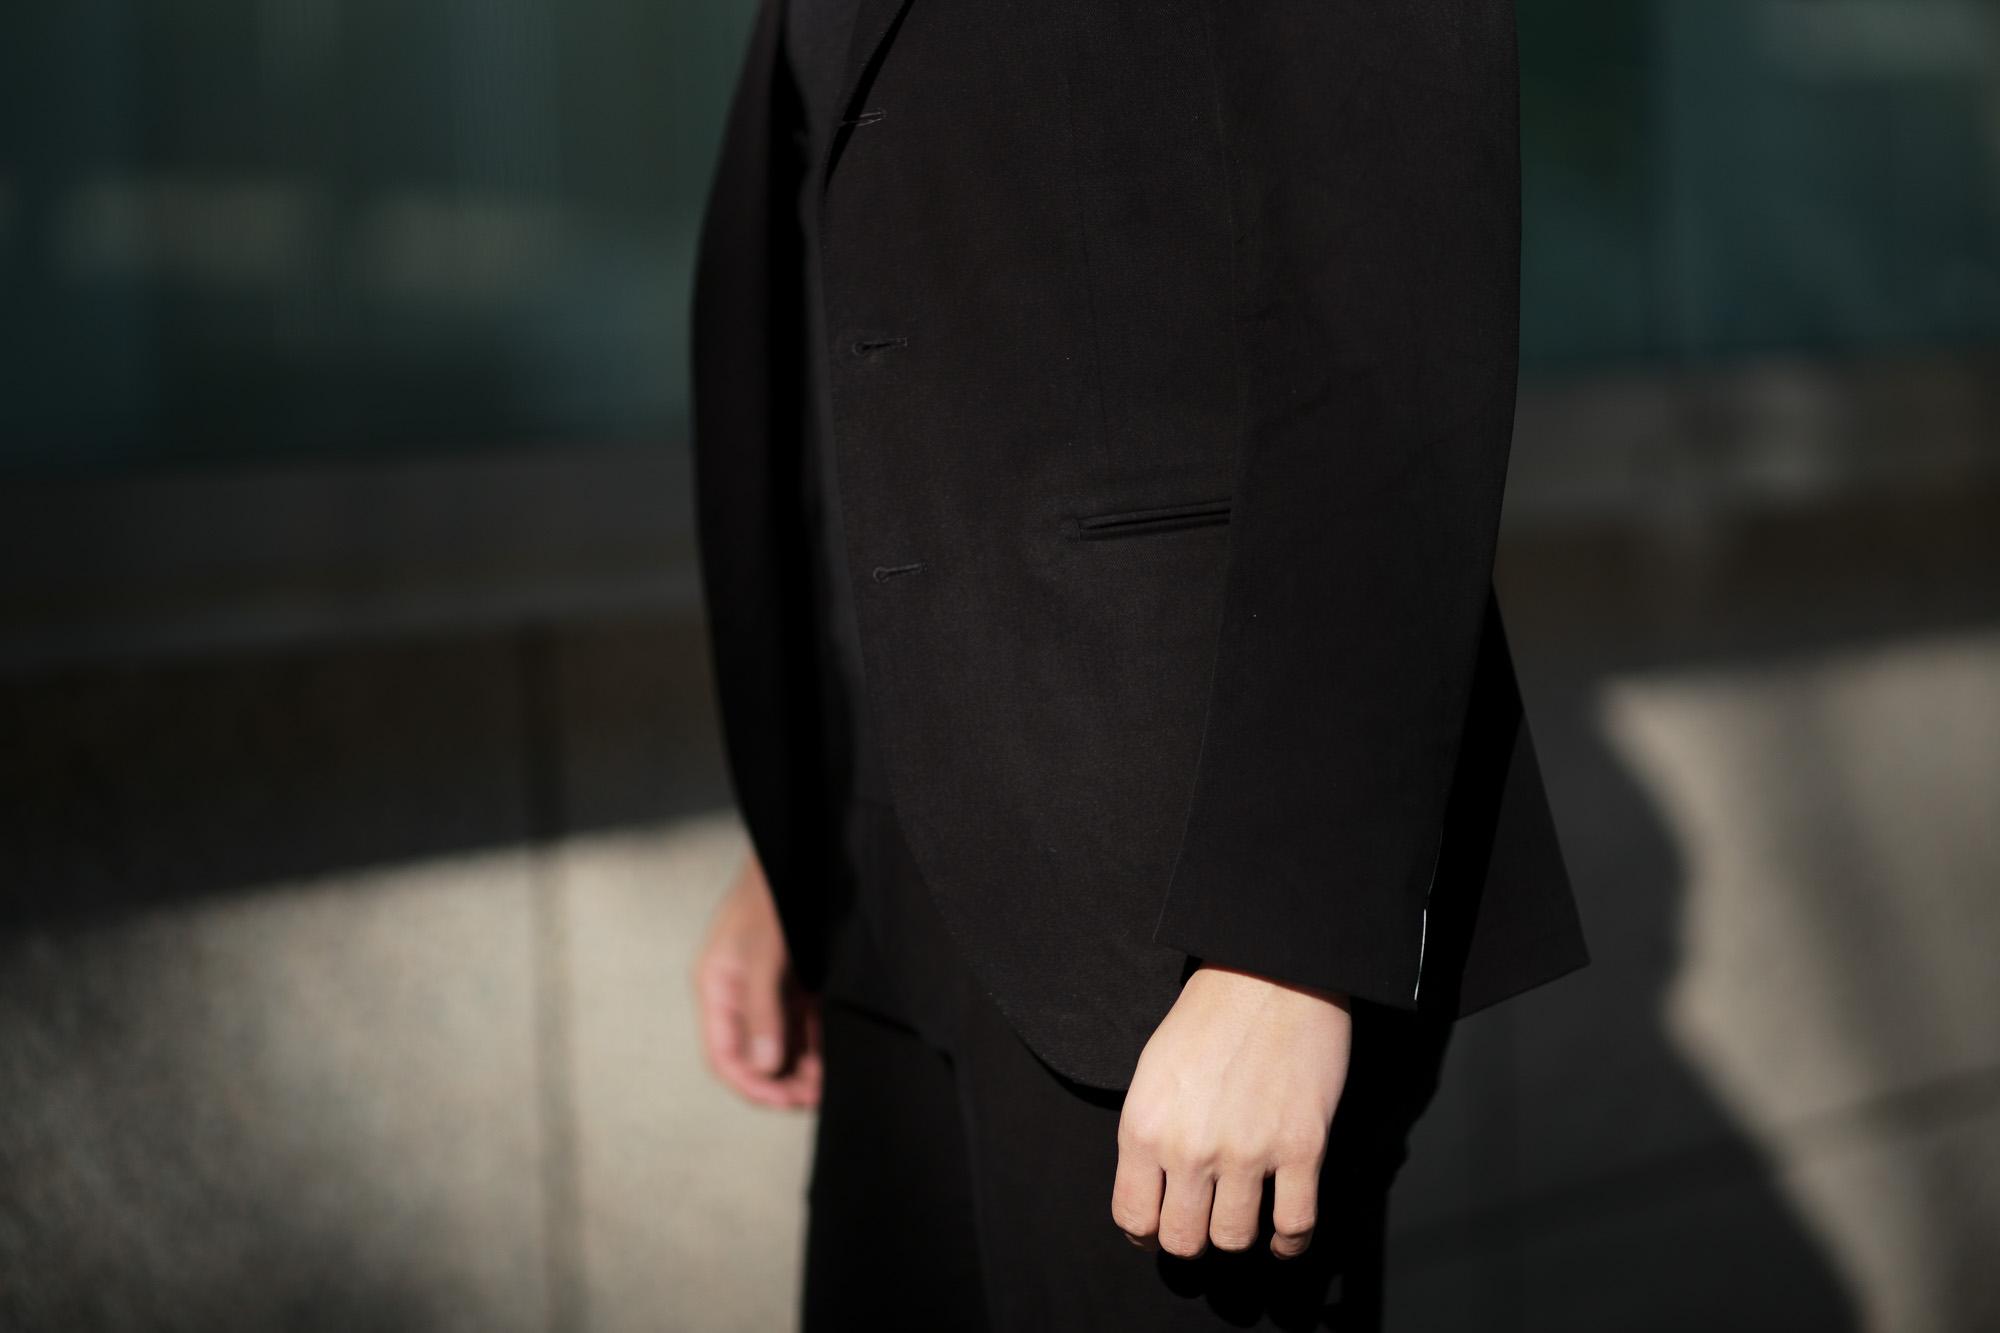 Cuervo (クエルボ) Sartoria Collection (サルトリア コレクション) Rooster (ルースター) STRETCH COTTON ストレッチコットン スーツ BLACK (ブラック) MADE IN JAPAN (日本製) 2019 春夏新作 【第2便ご予約受付中】 alto e diritto アルトエデリット